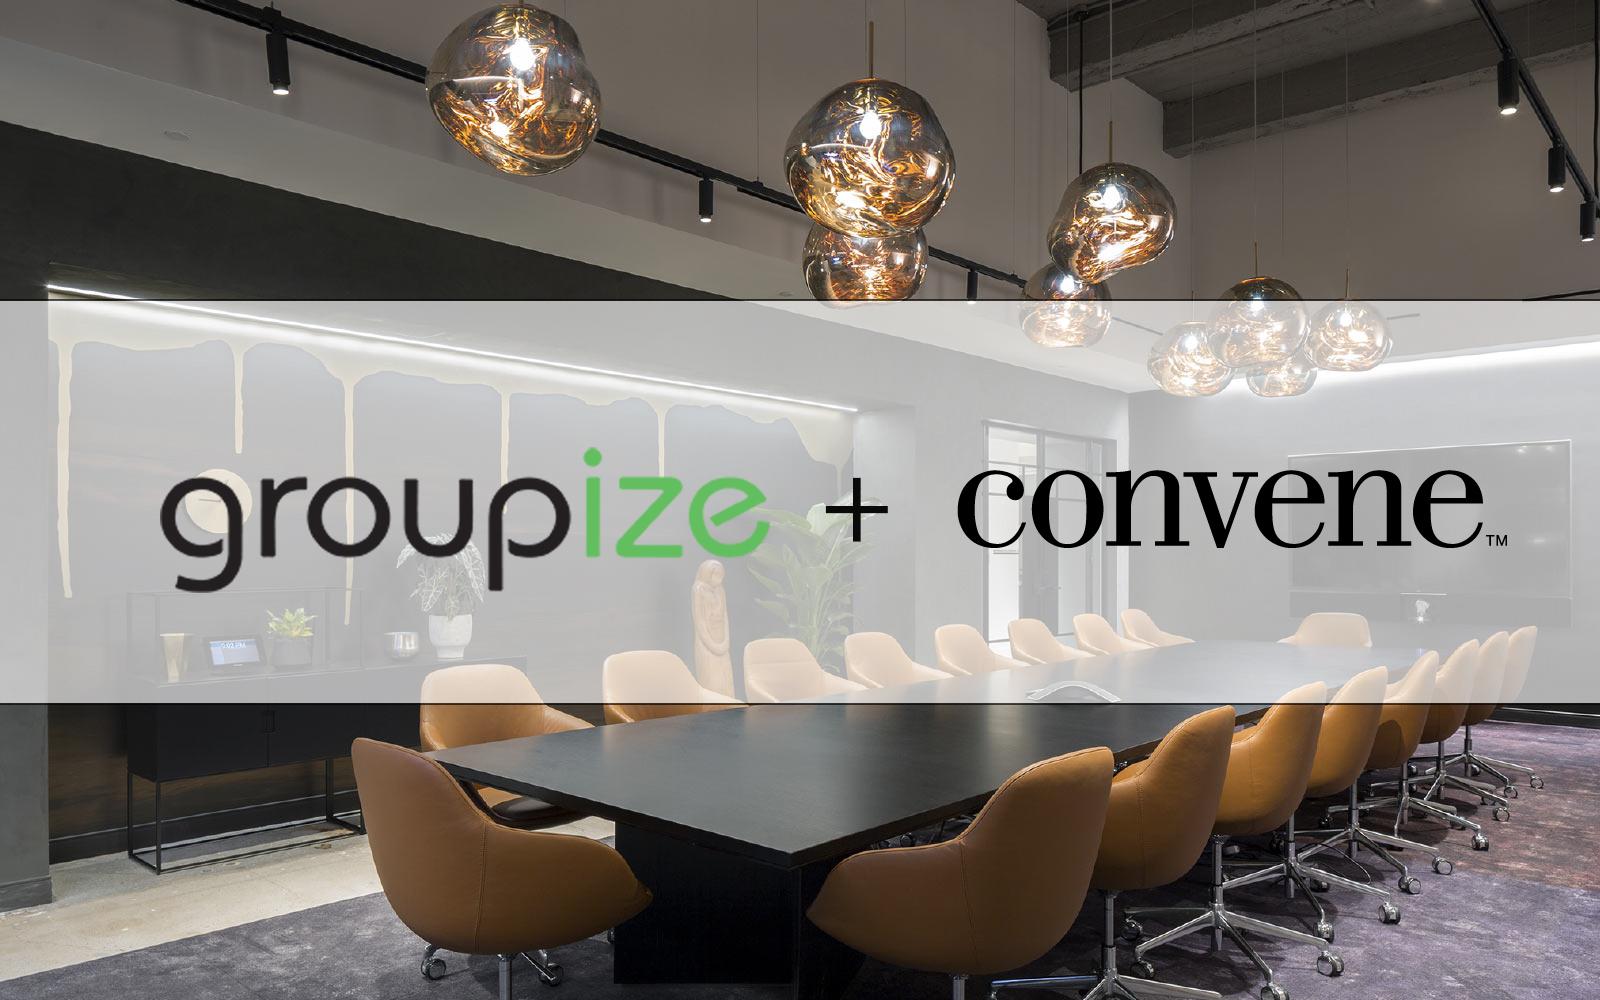 convene groupize partnership (1)